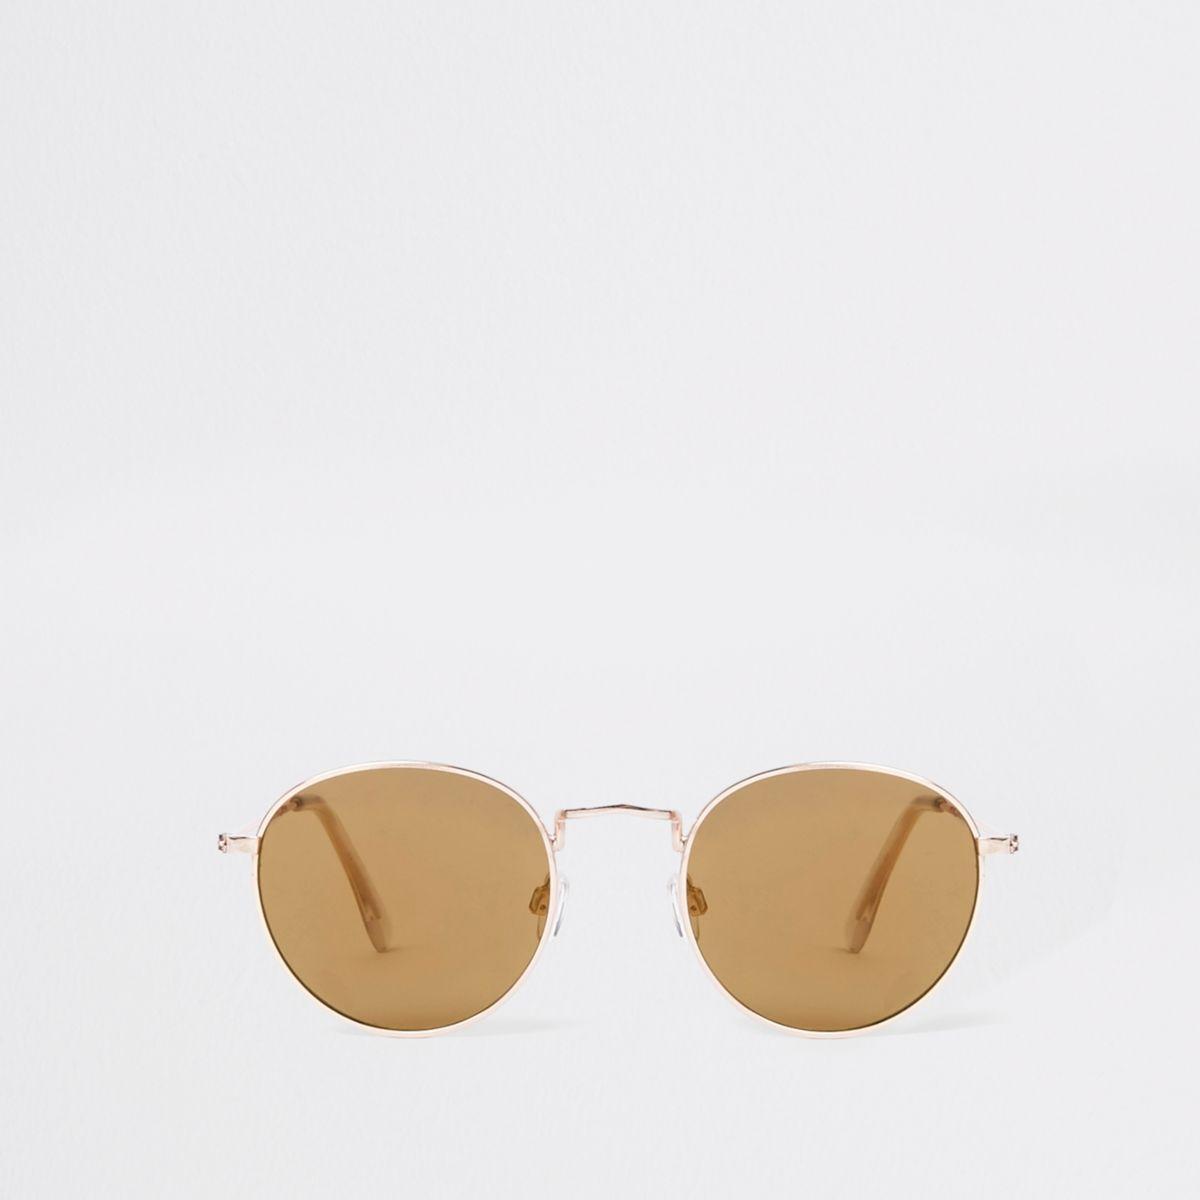 Rose gold tone round smoke lens sunglasses